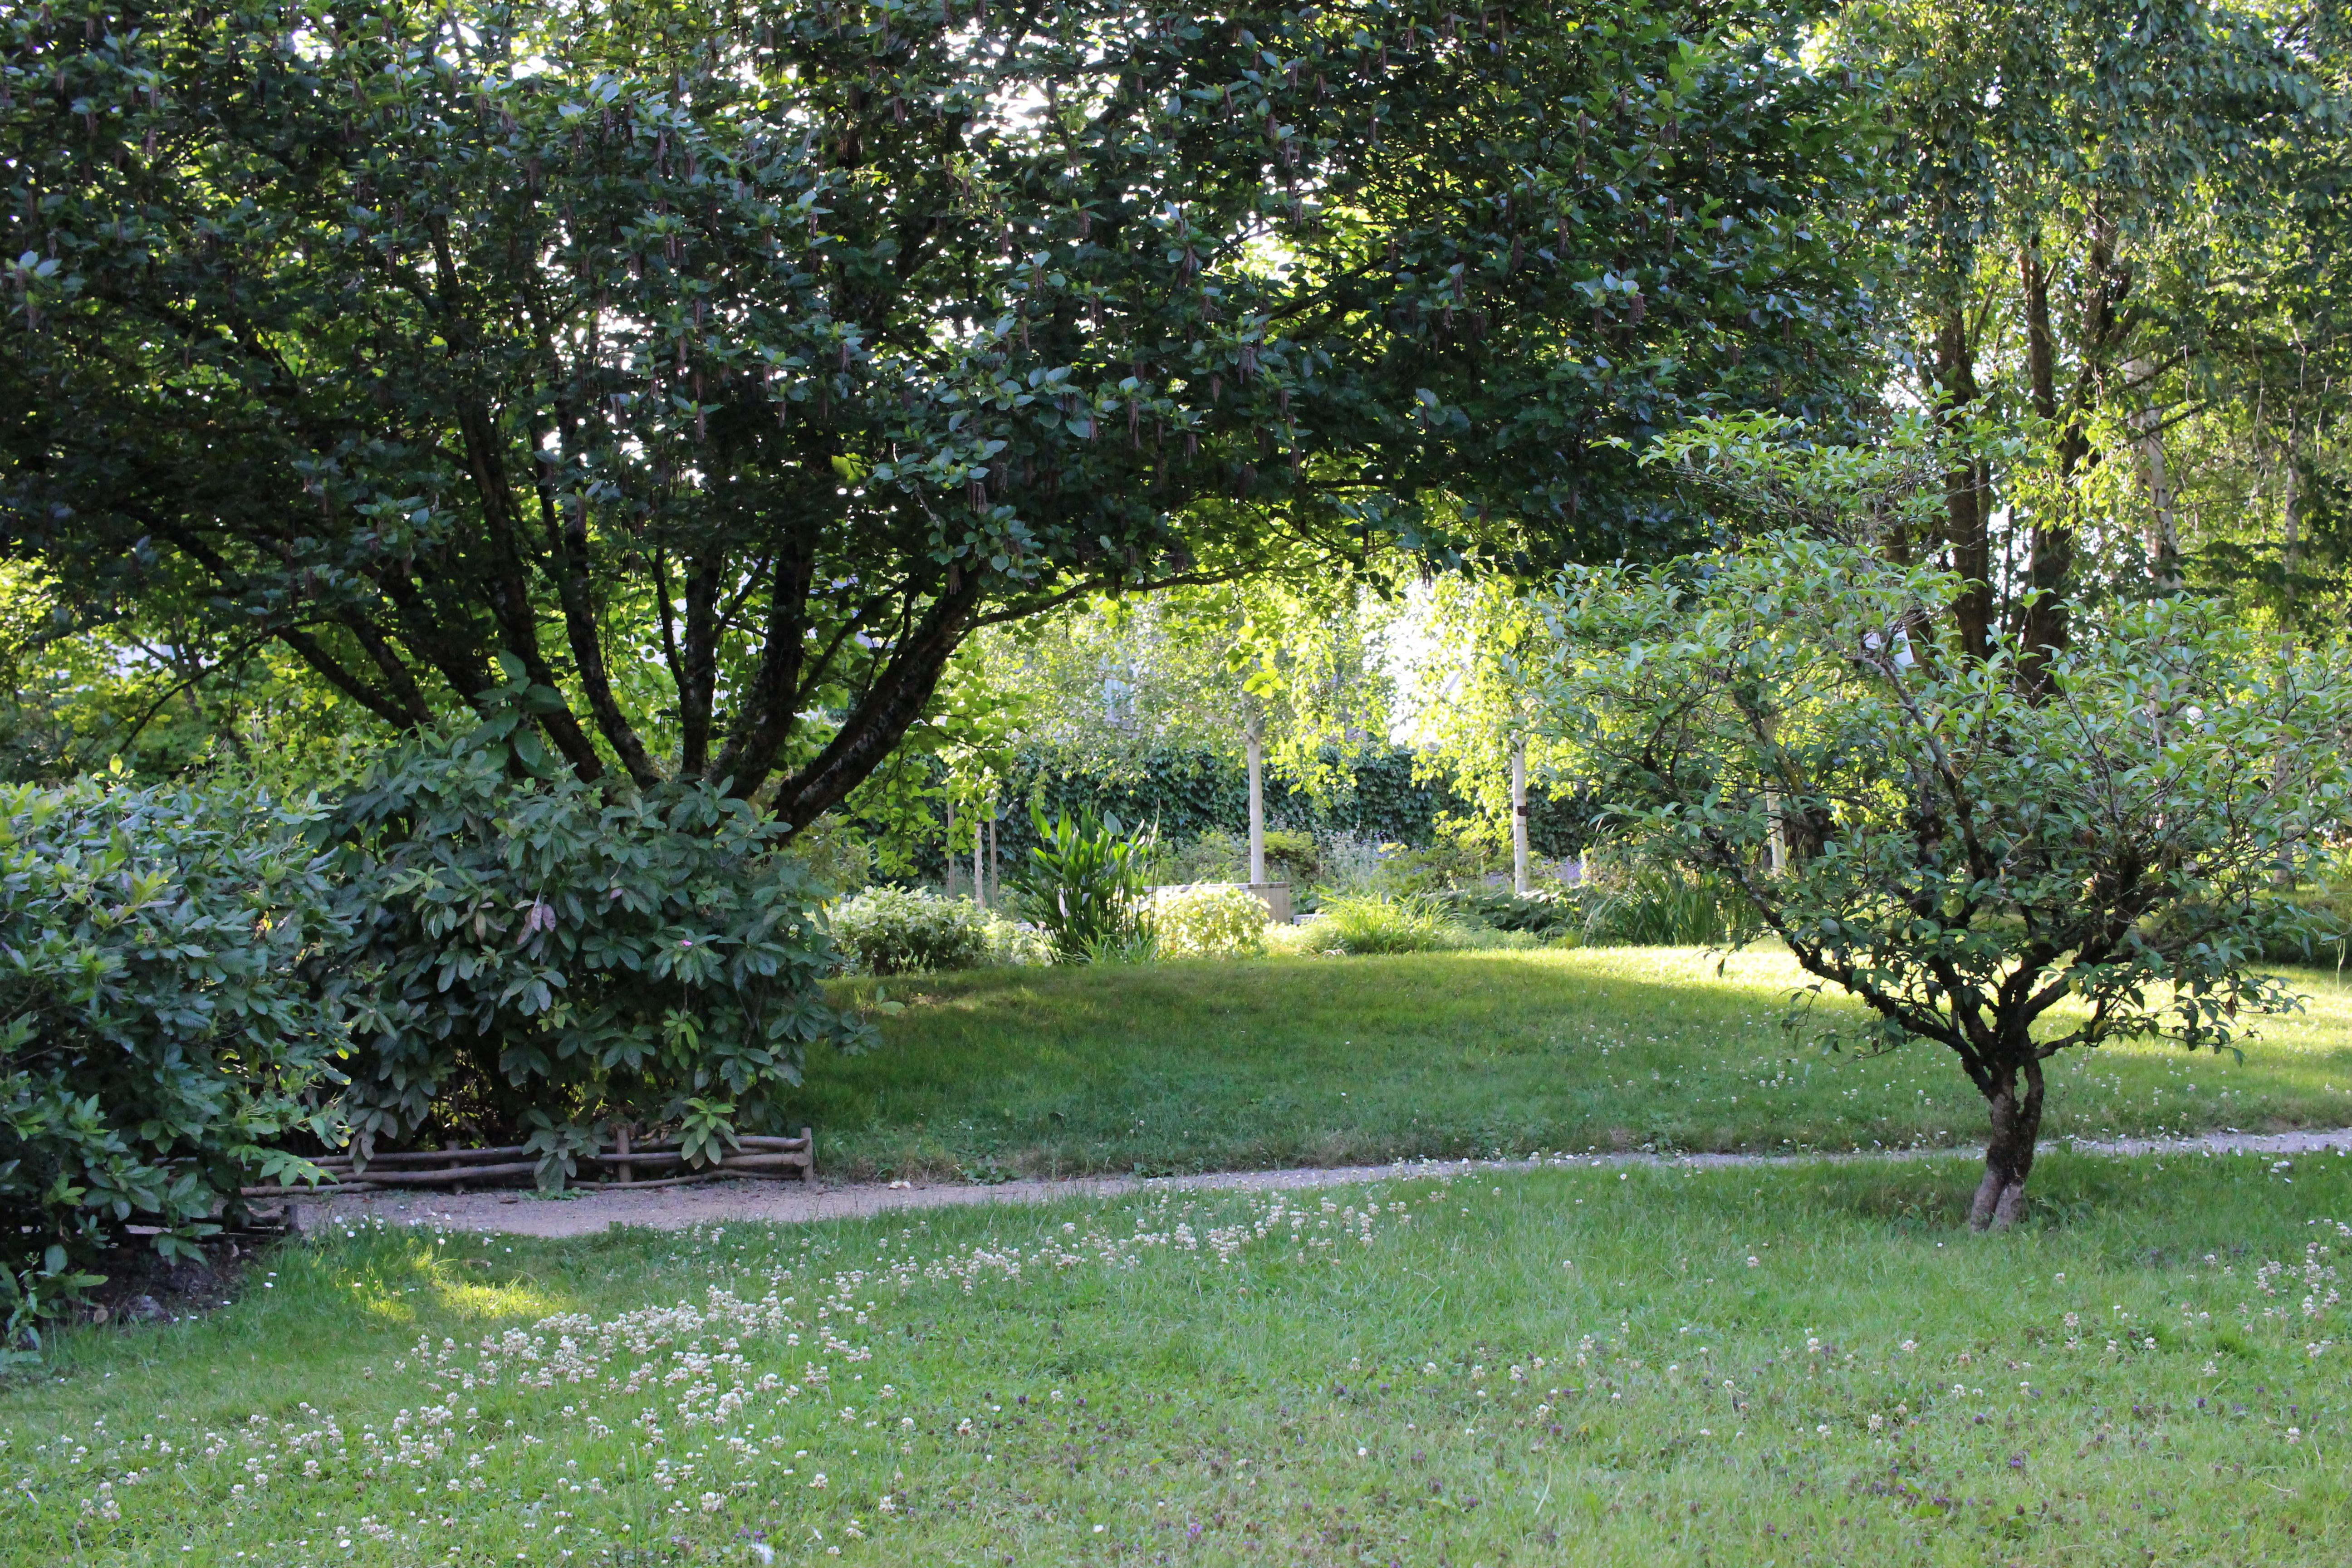 File Tours Allée Jardin Botanique 03 Wikimedia mons